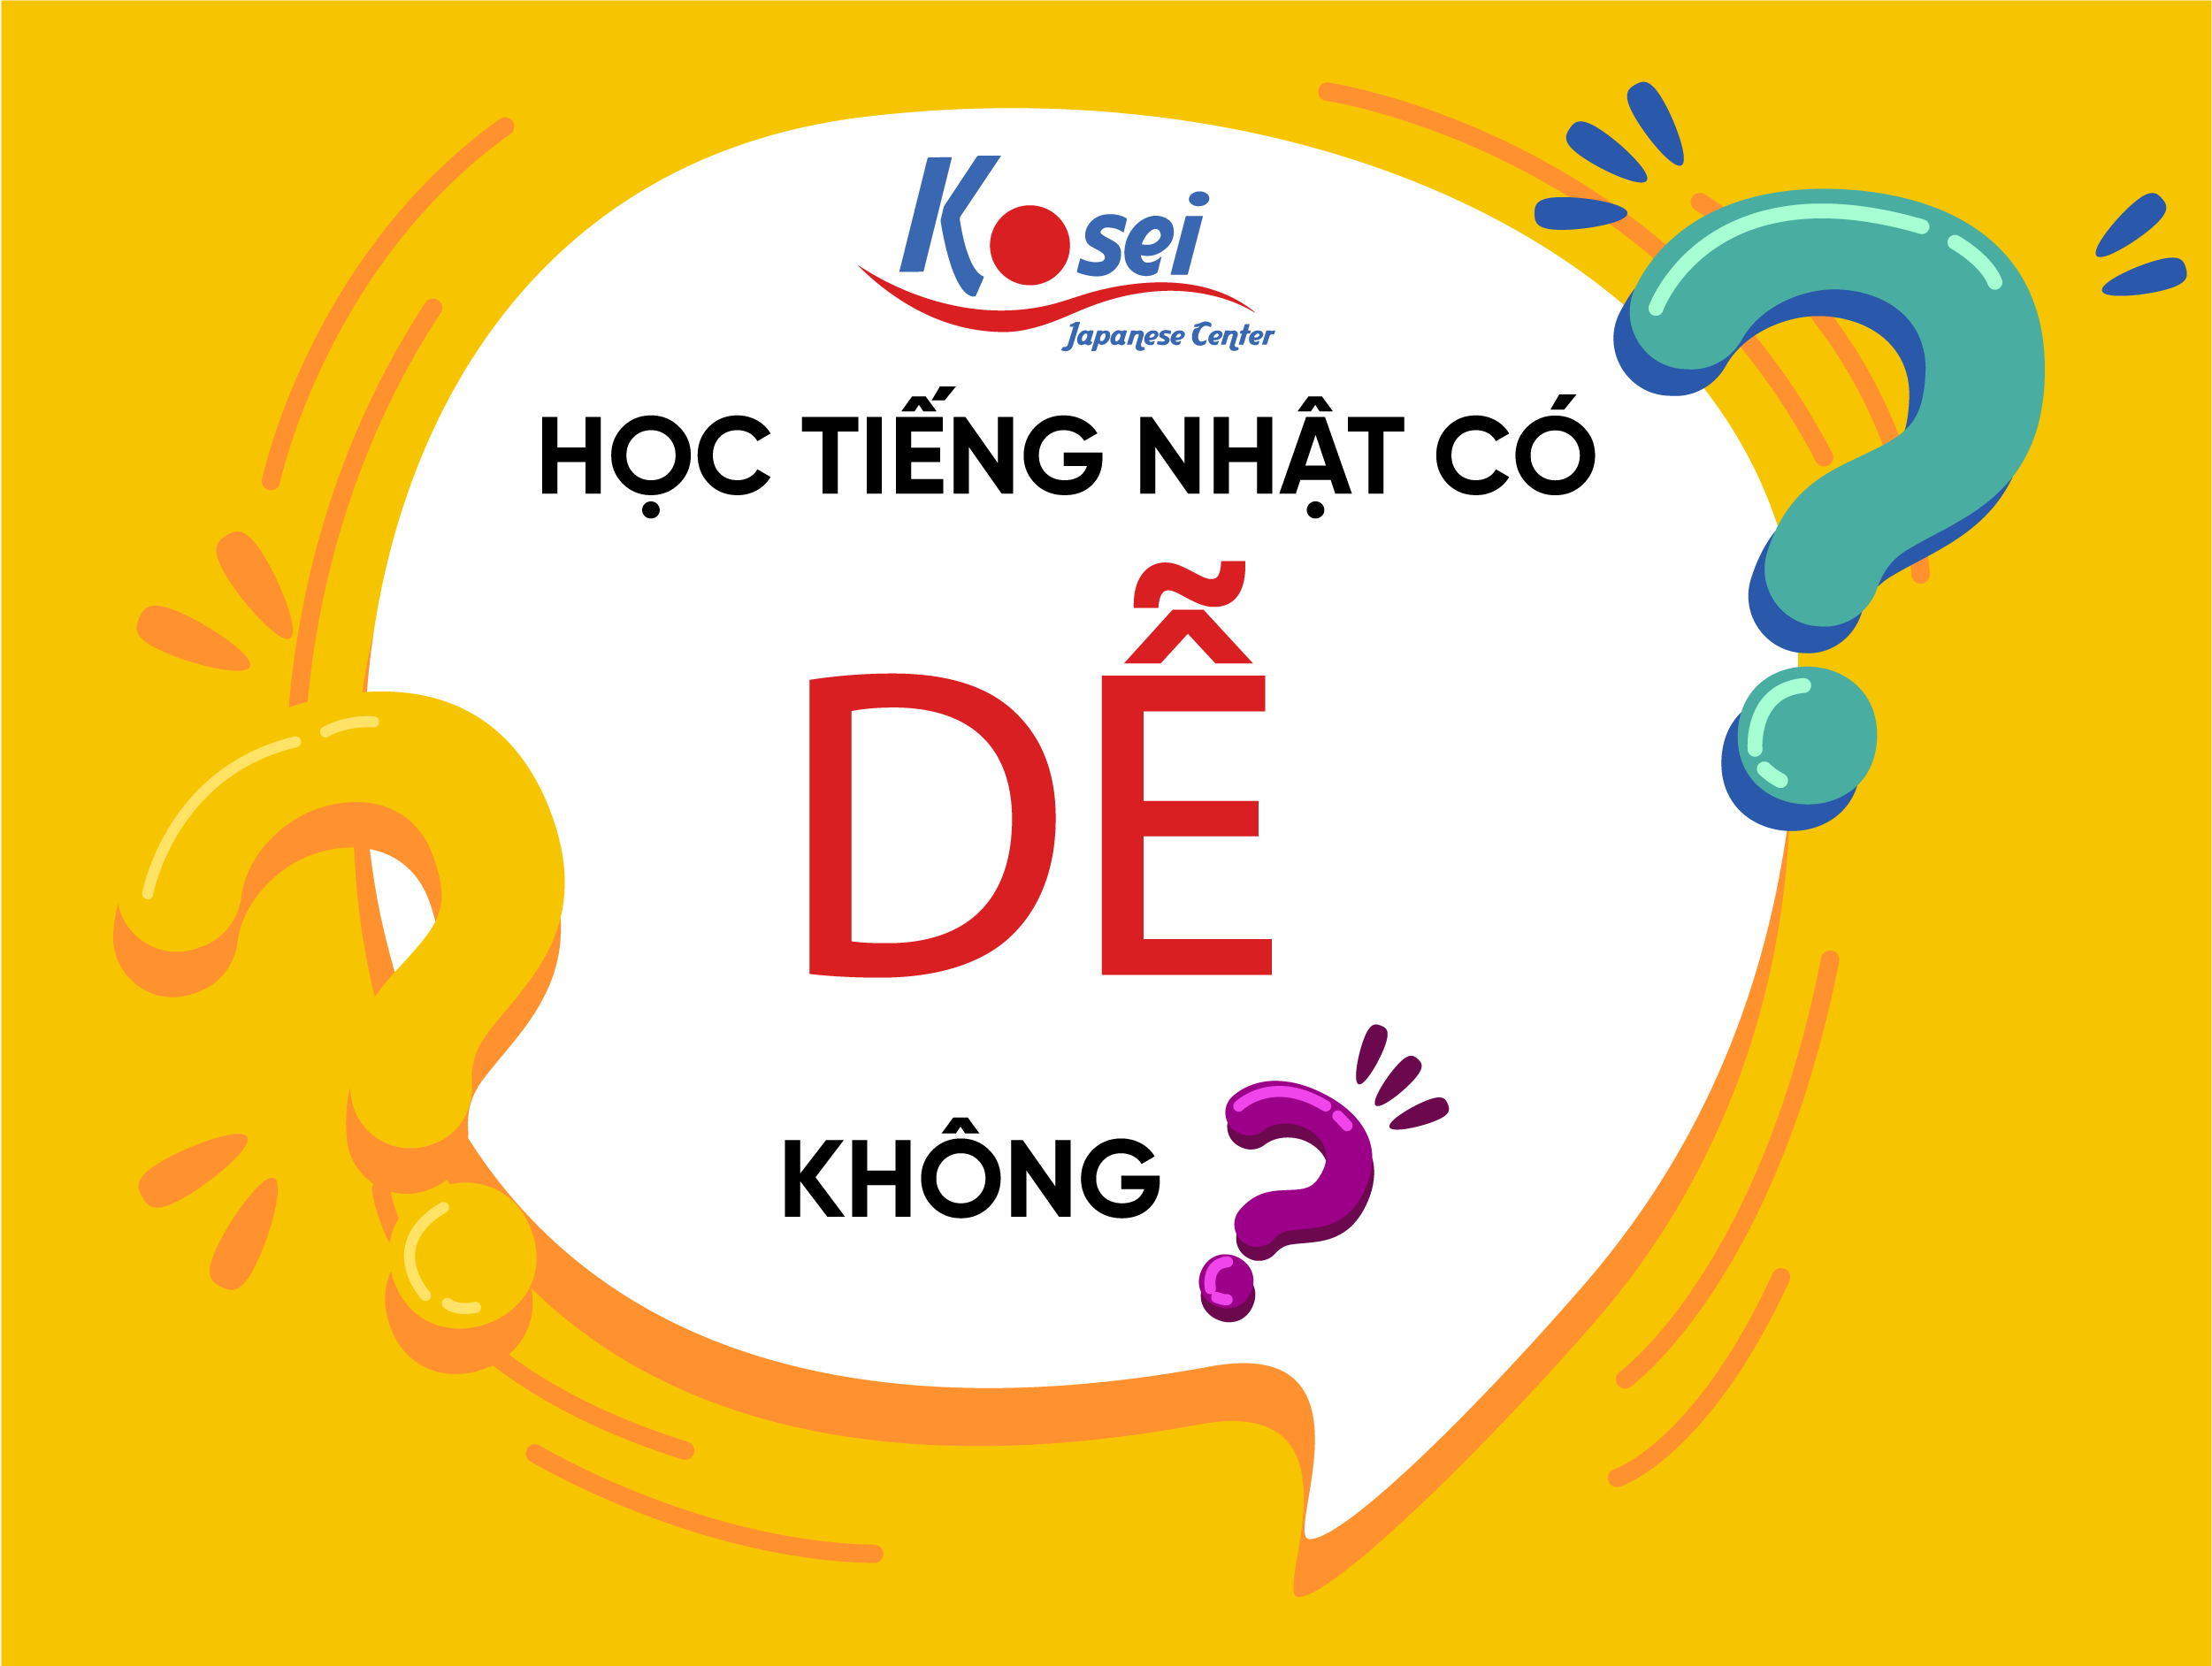 https://kosei.vn/hoc-tieng-nhat-co-de-khong-n3109.html